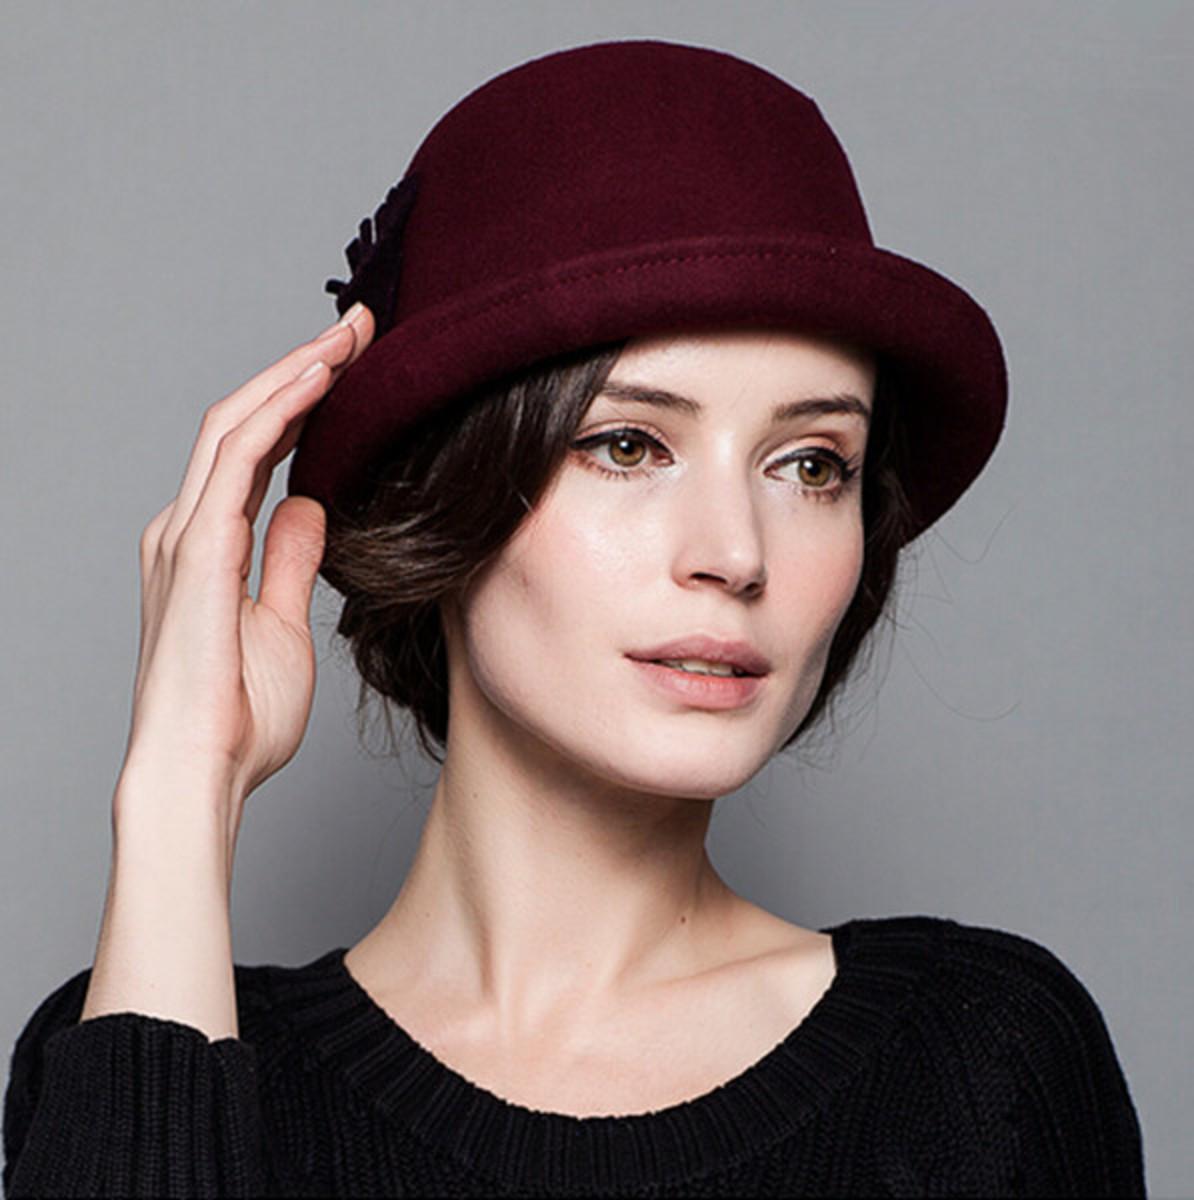 Burgundy bowler hat